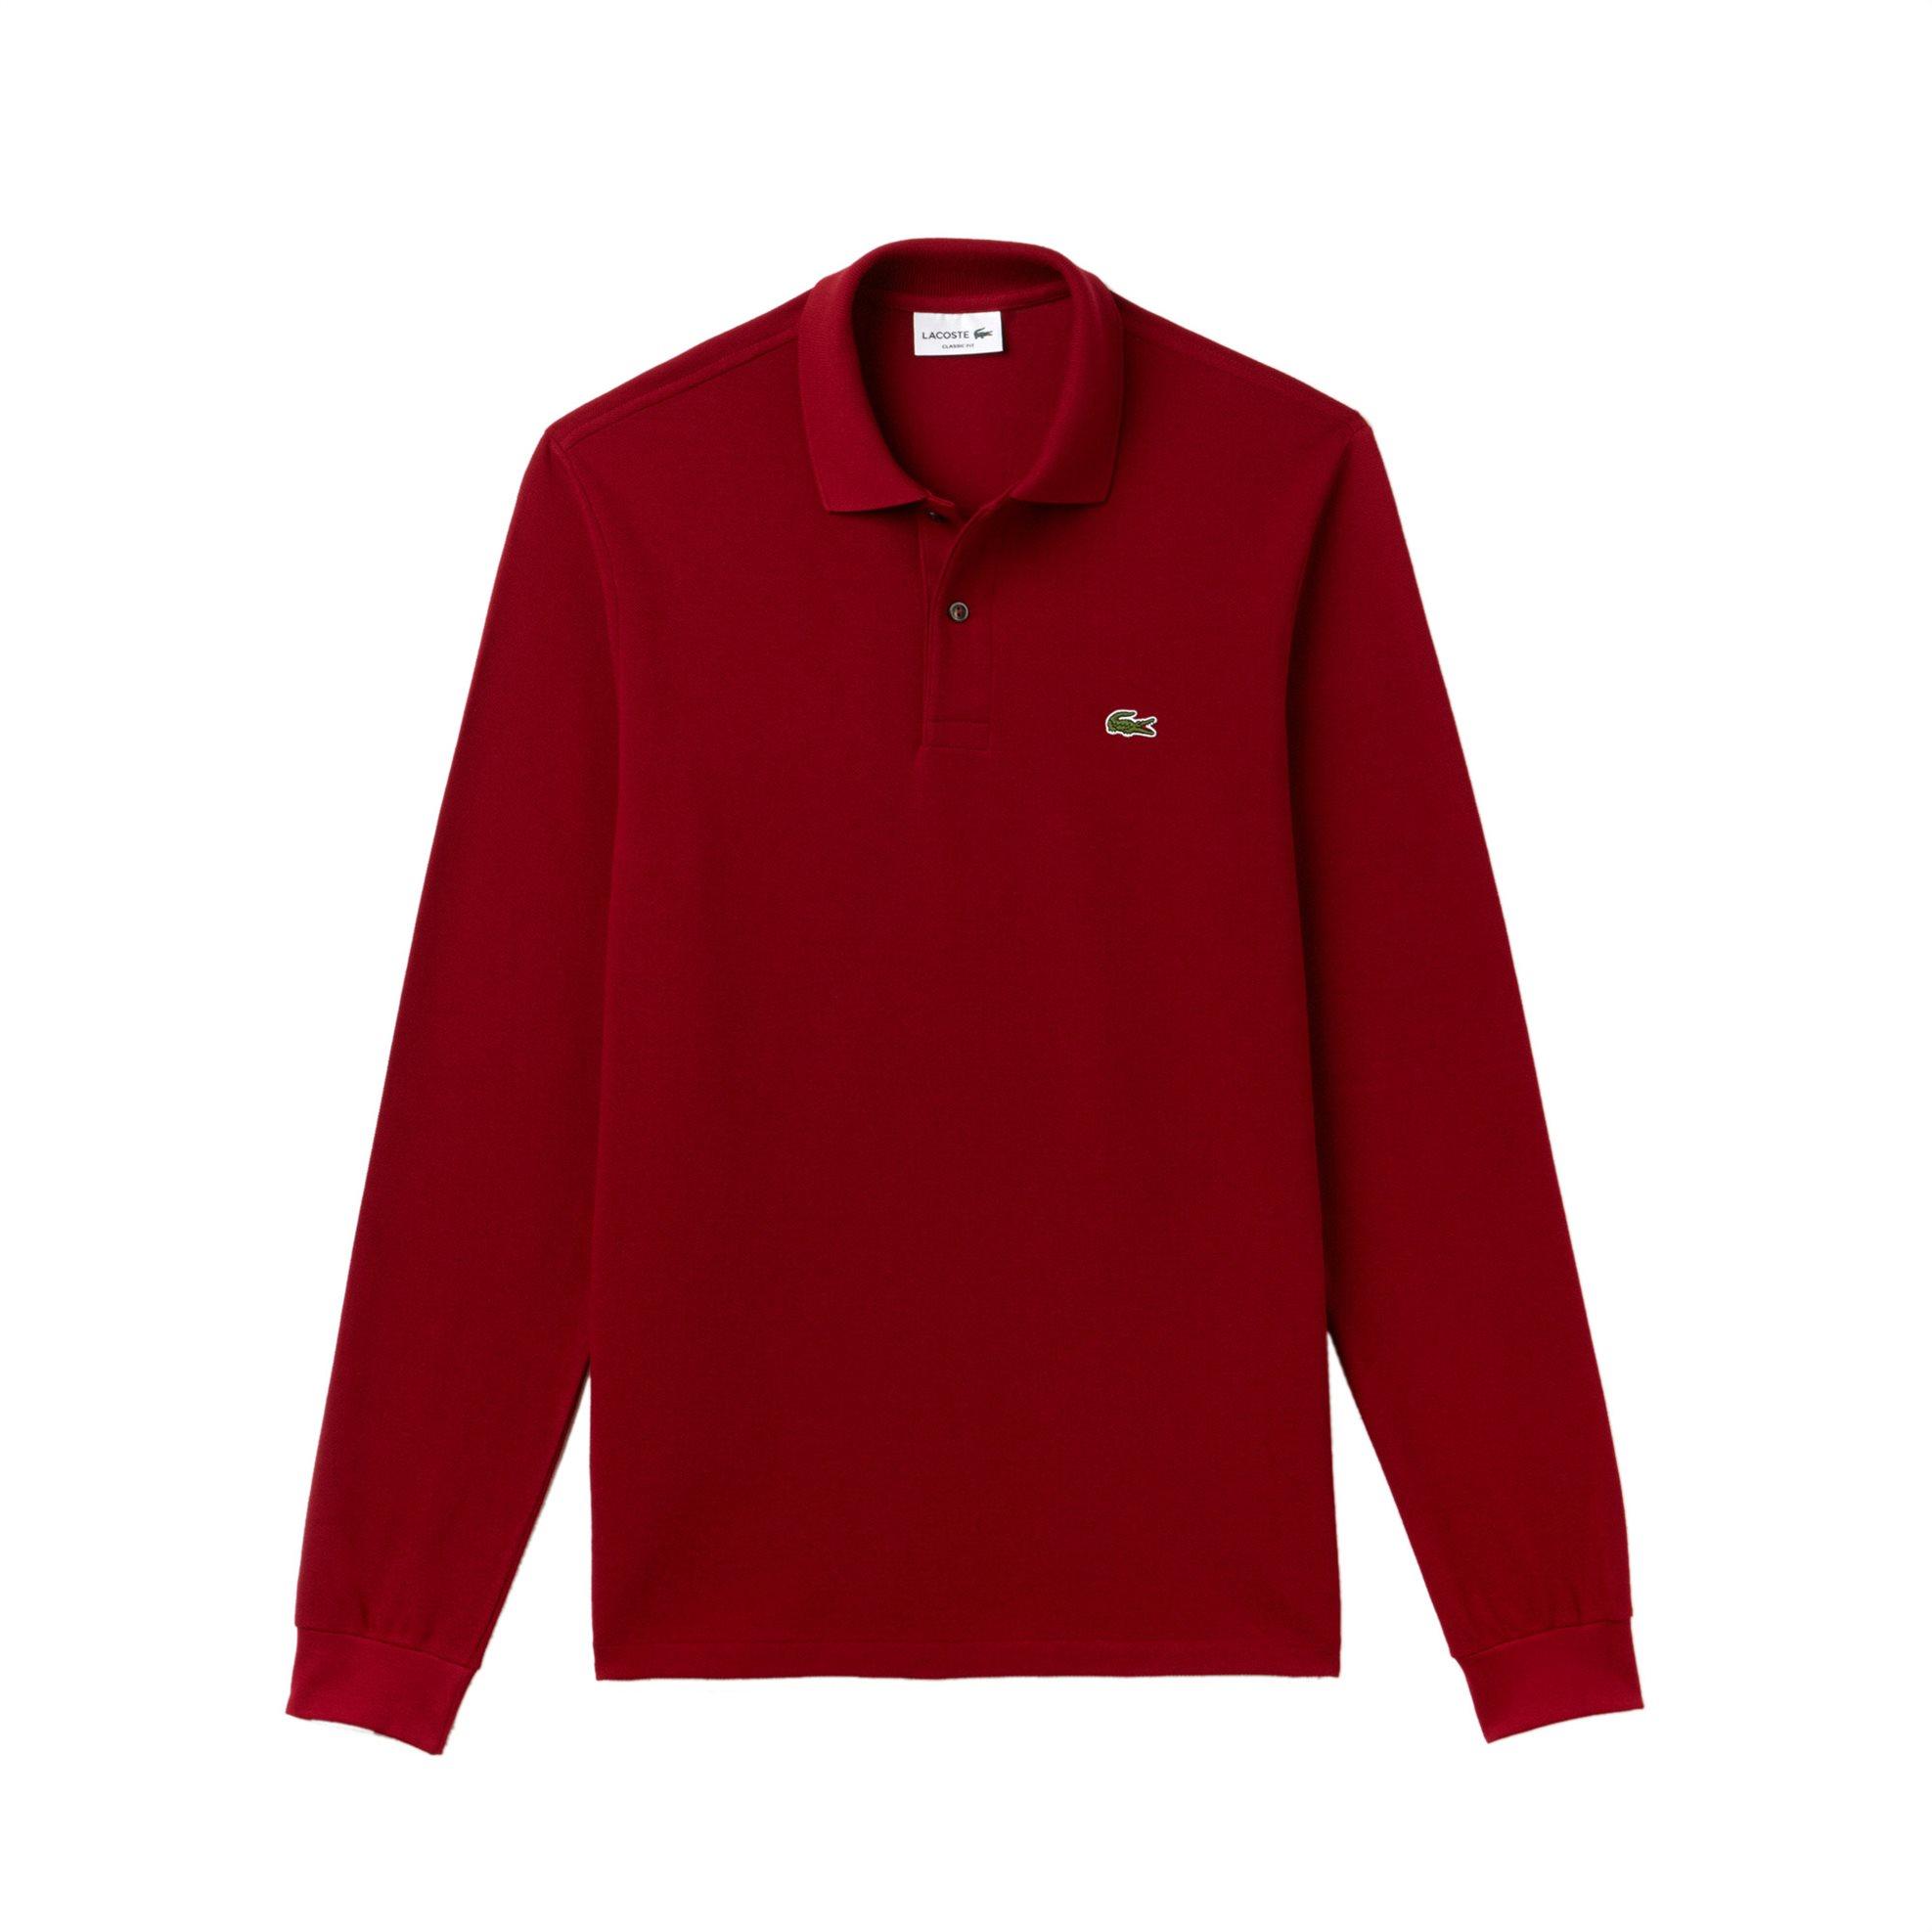 Lacoste ανδρική μπλούζα Polo L.12.12 με μακρύ μανίκι - L1312 - Μπορντό ανδρασ   ρουχα    νεεσ αφιξεισ   μπλούζες   πόλο